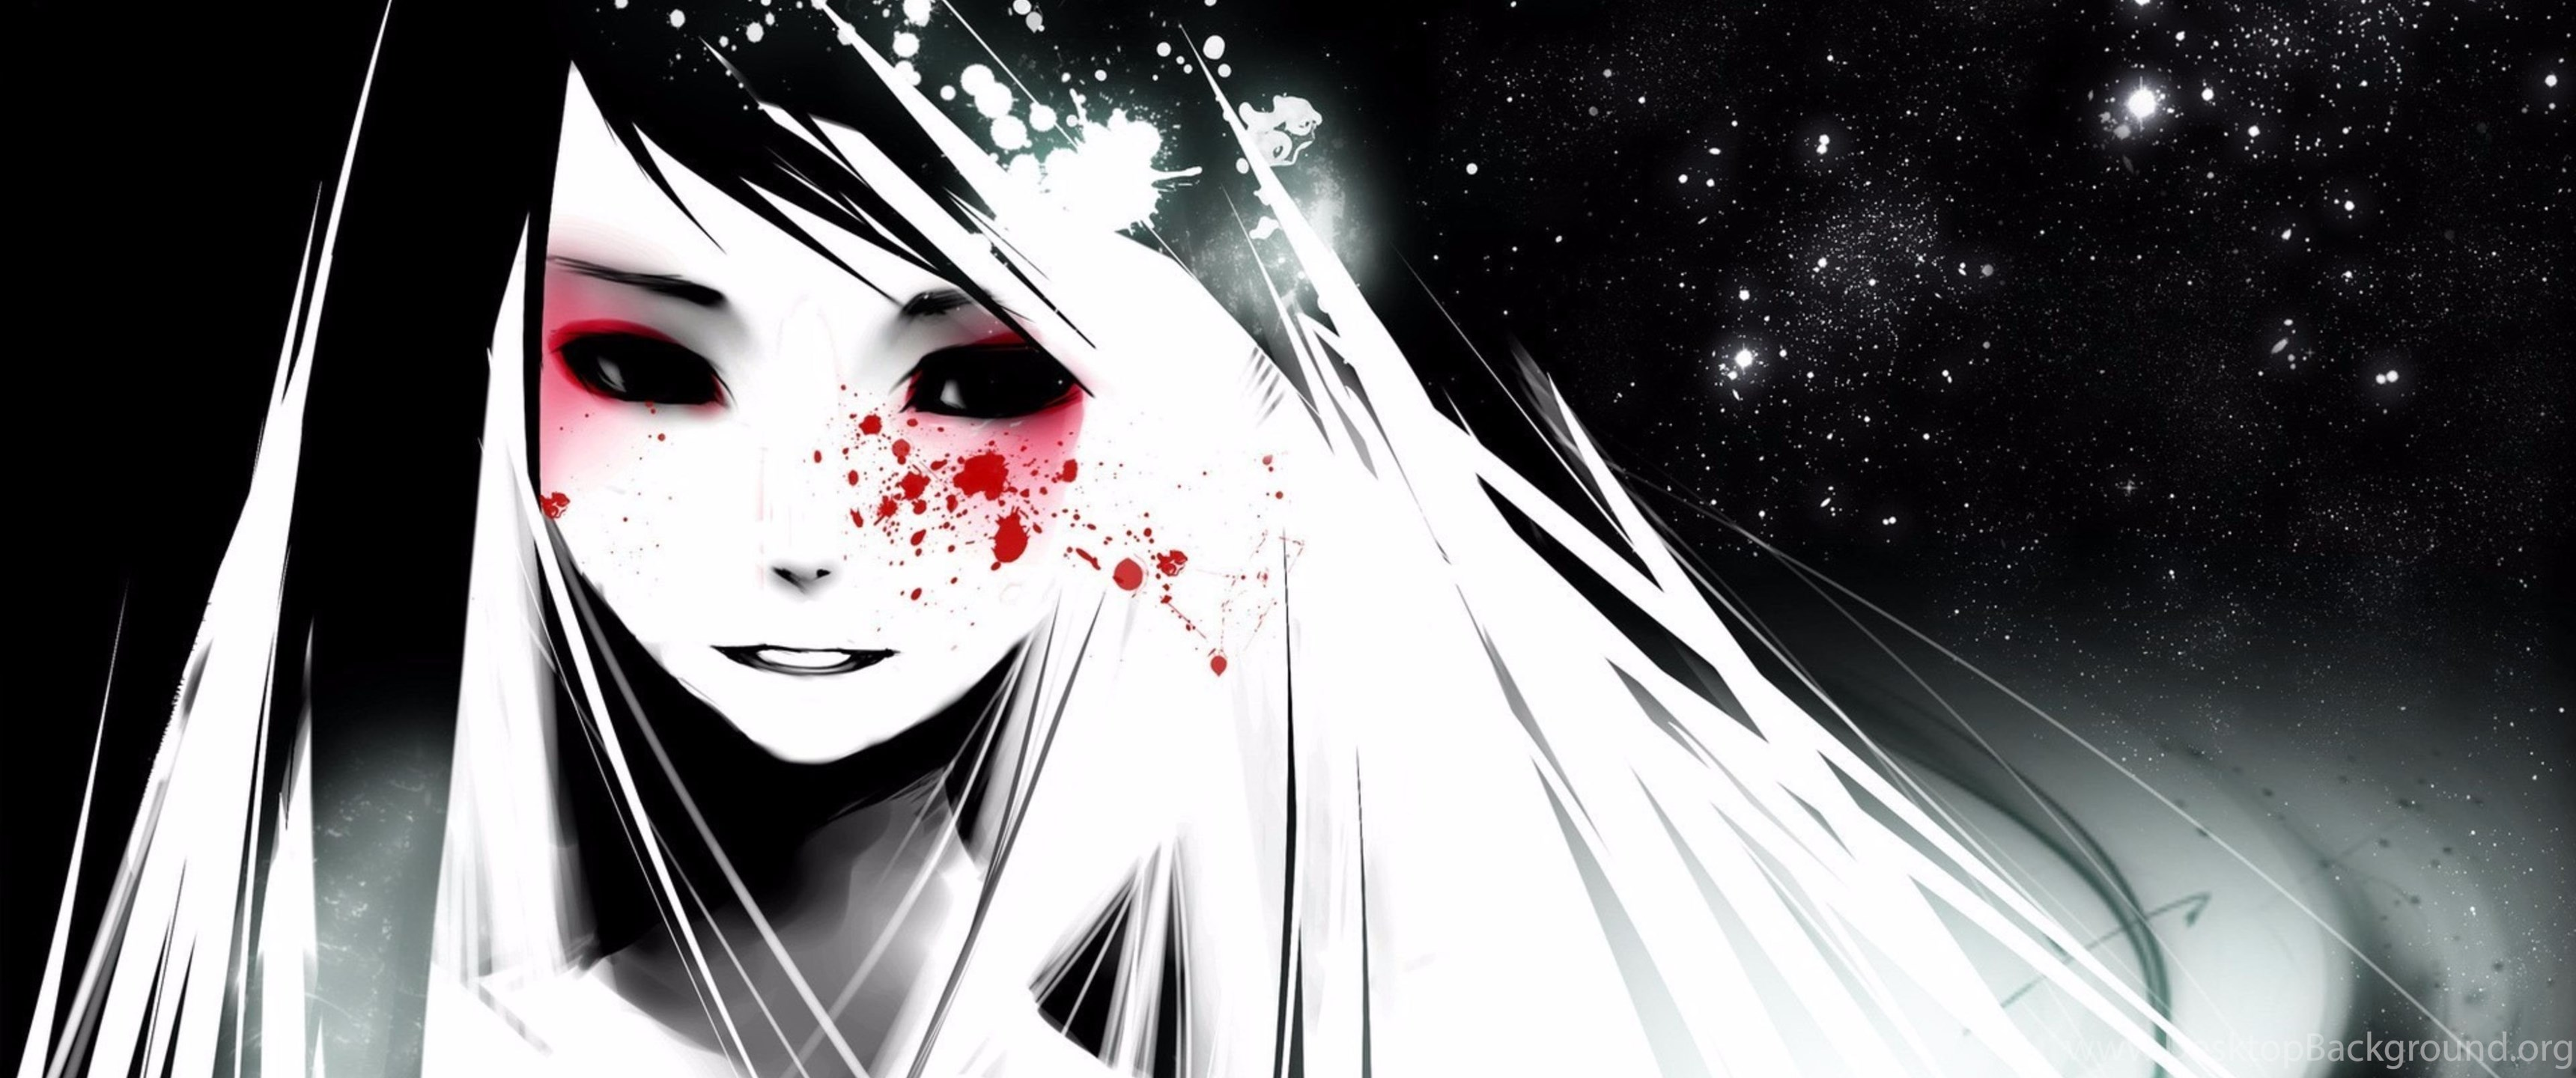 Red tears 4k anime wallpapers desktop background - Anime background wallpaper 4k ...